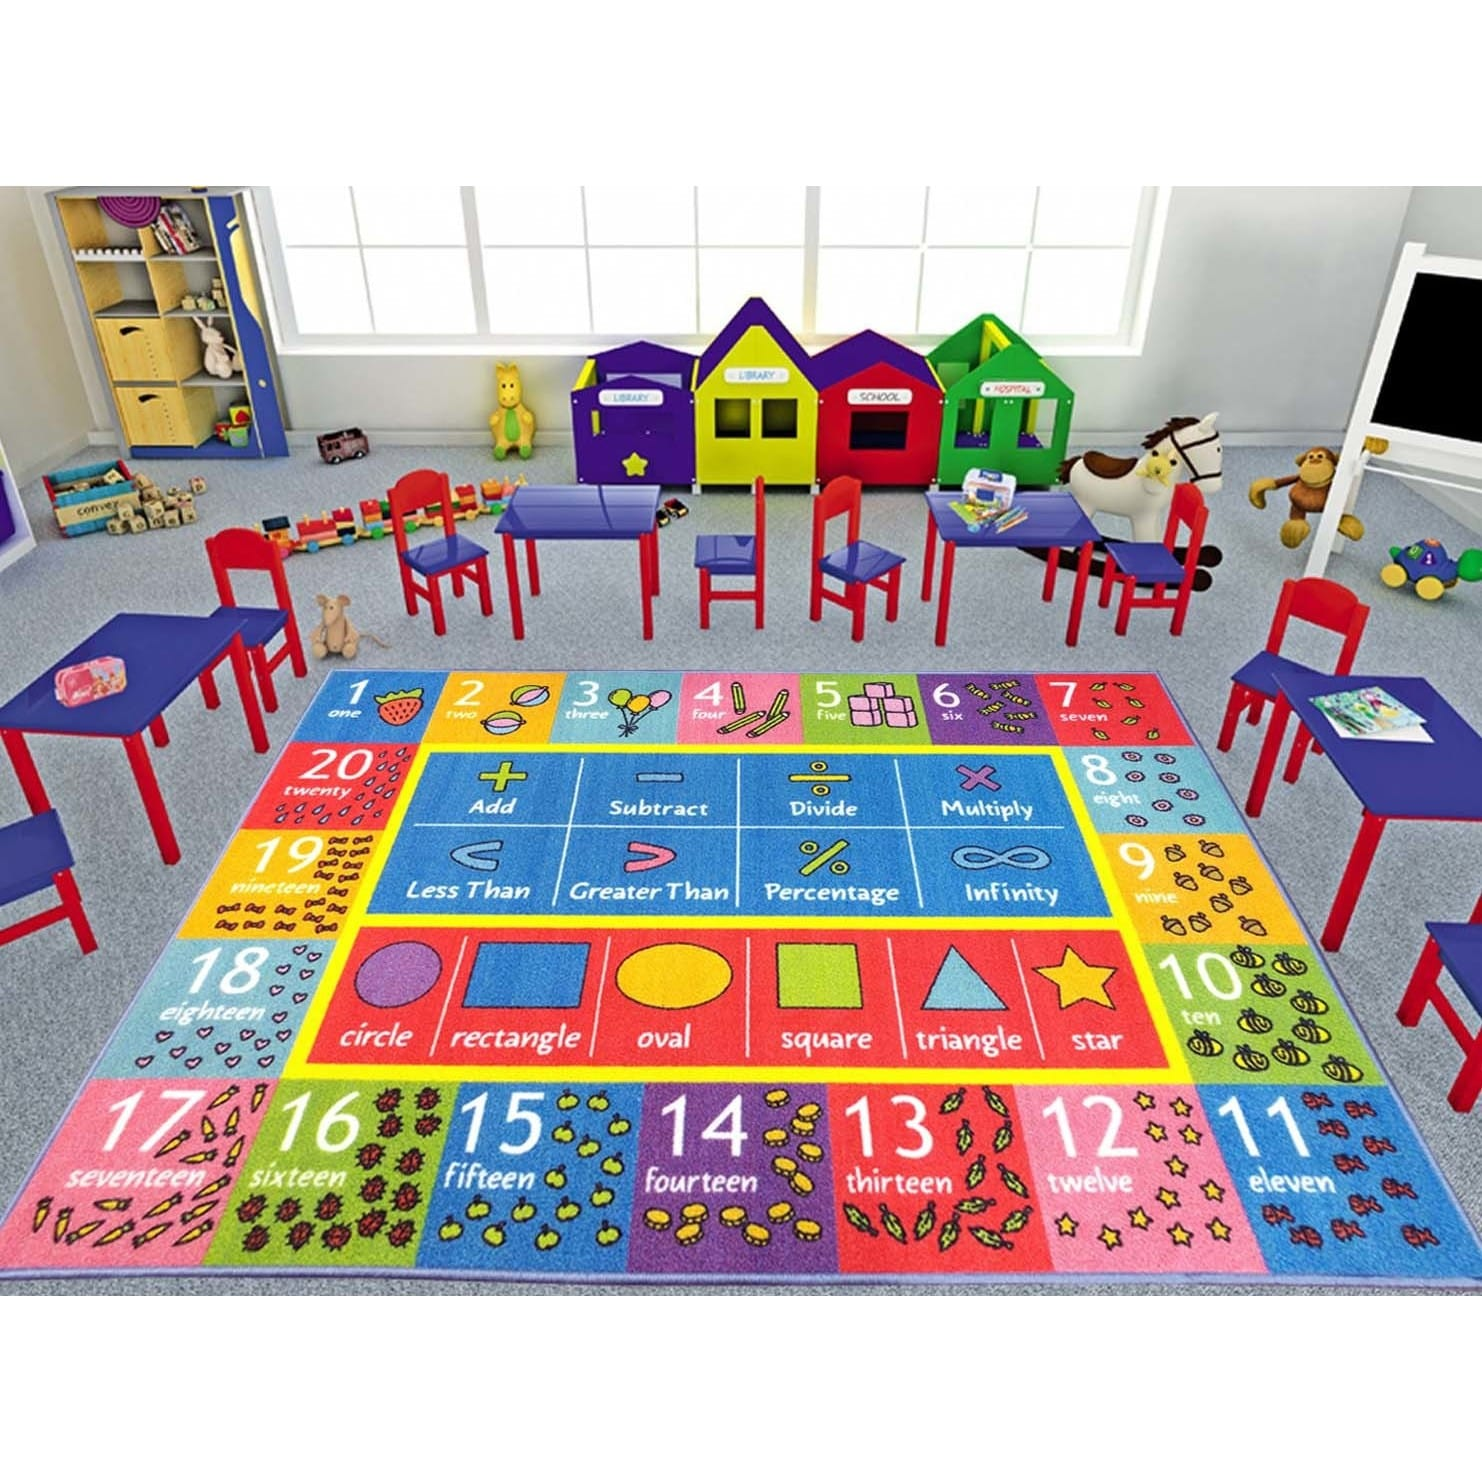 Shop Kc Cubs Math Symbols Numbers And Shapes Multicolor